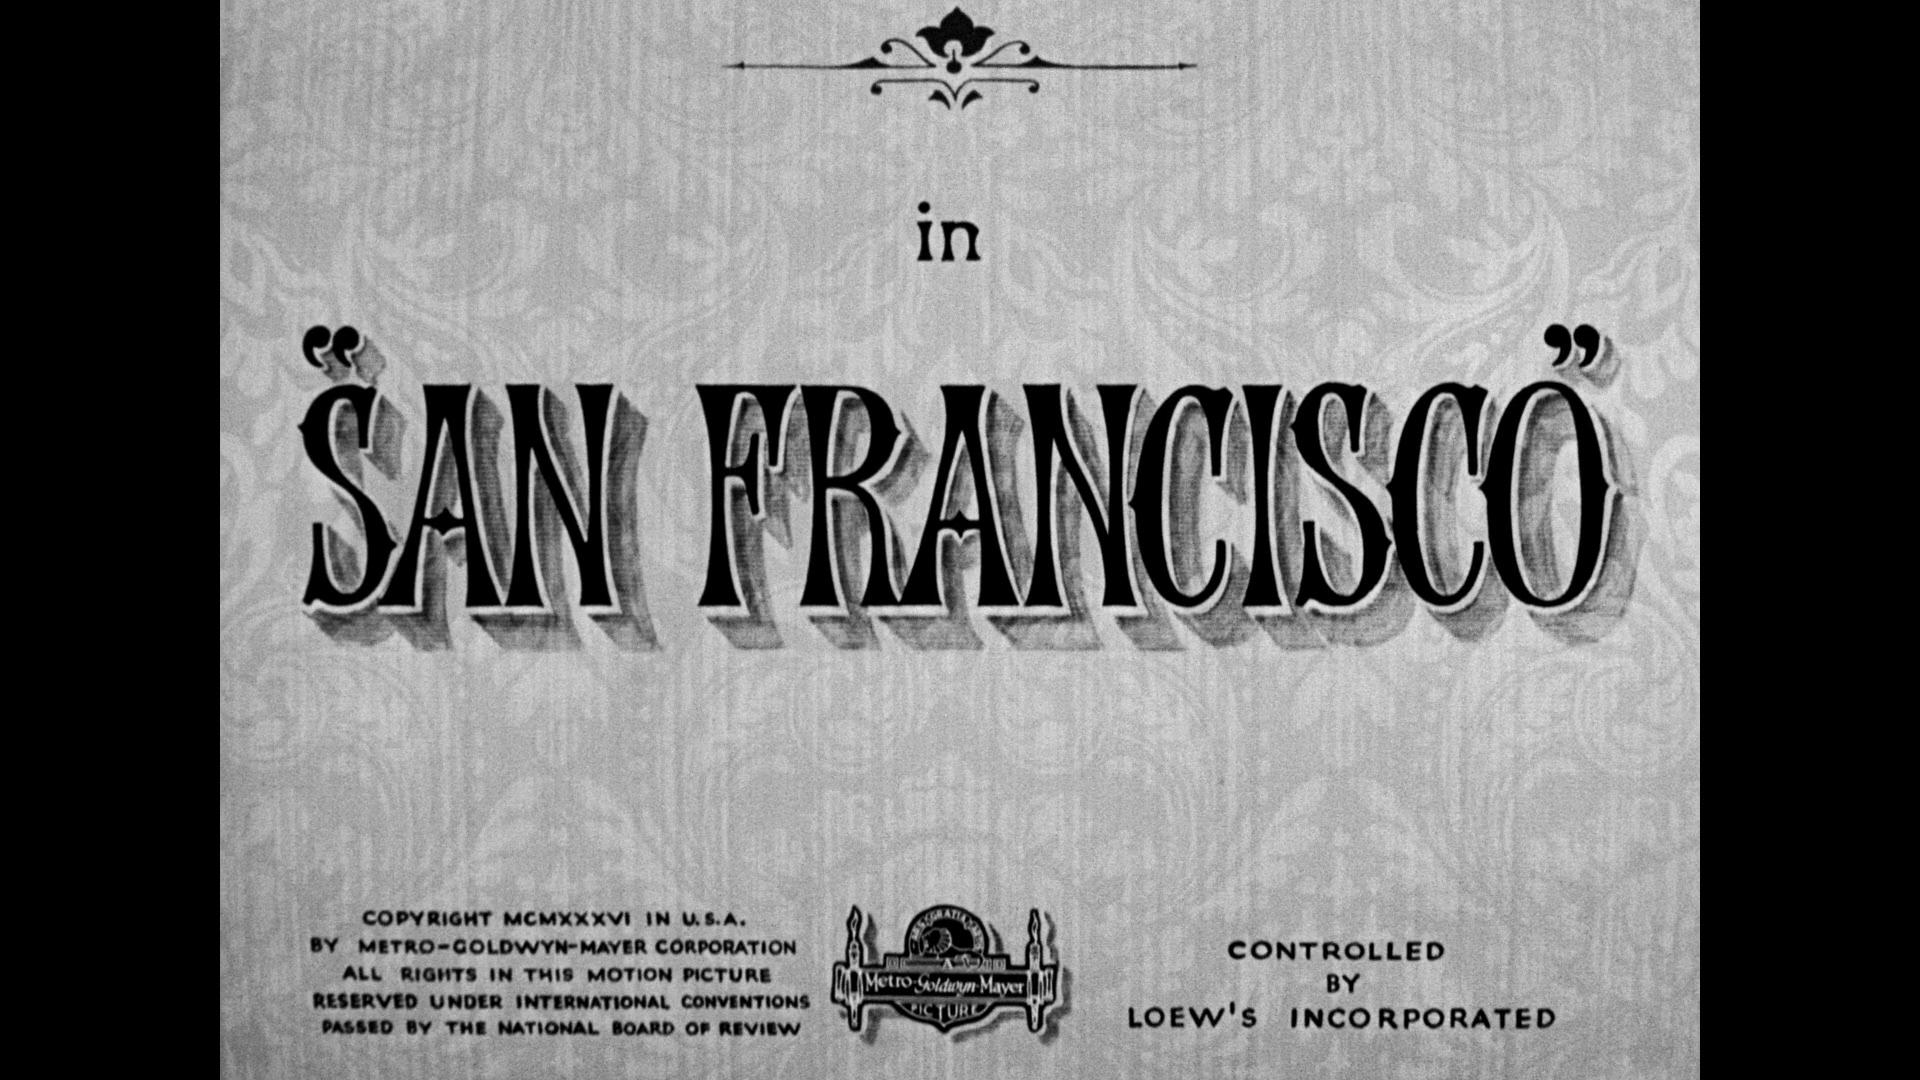 San Francisco Blu-ray title